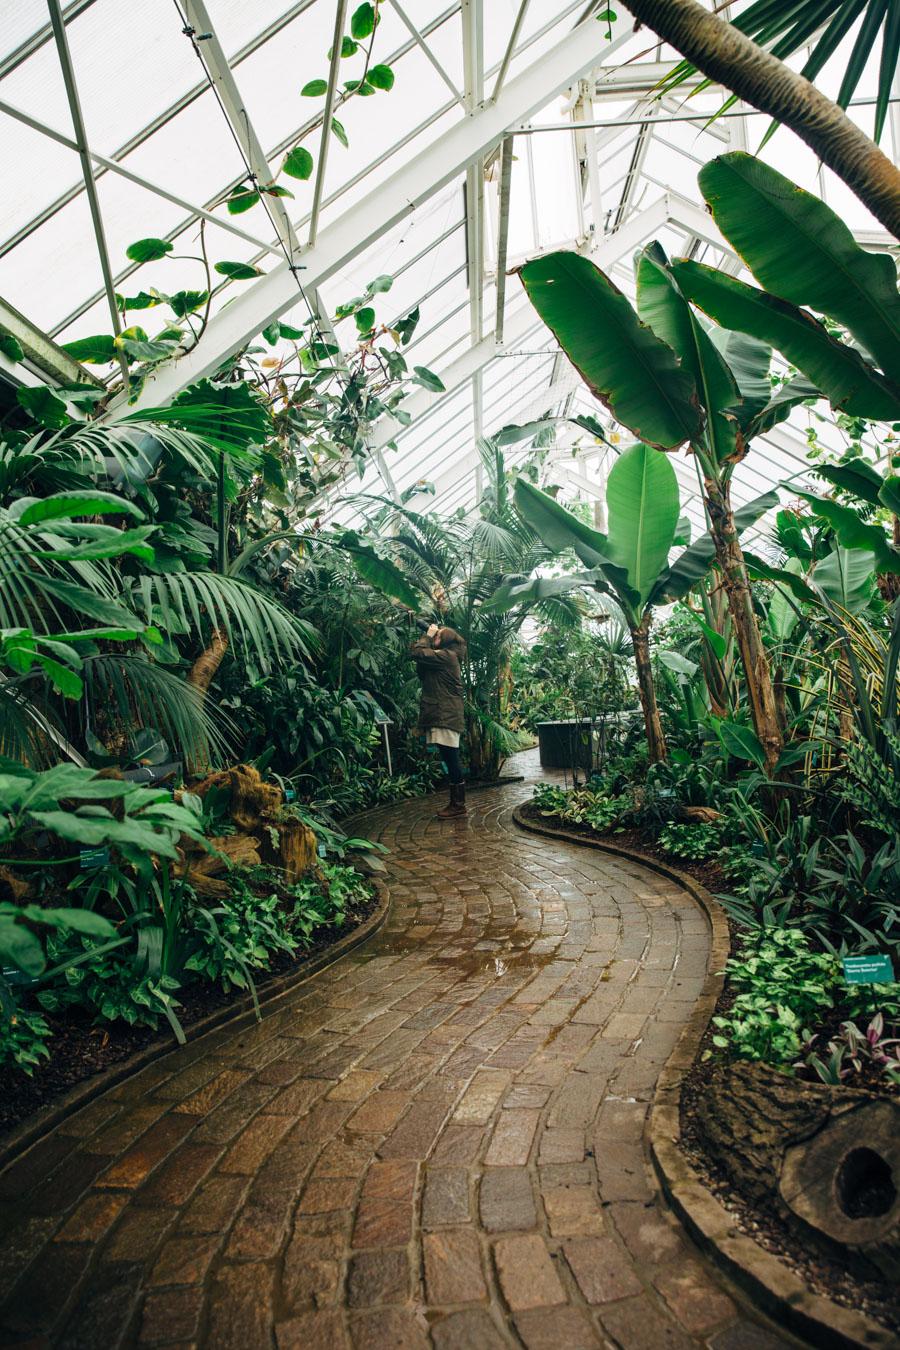 Inside the hothouse Wales Botanic garden